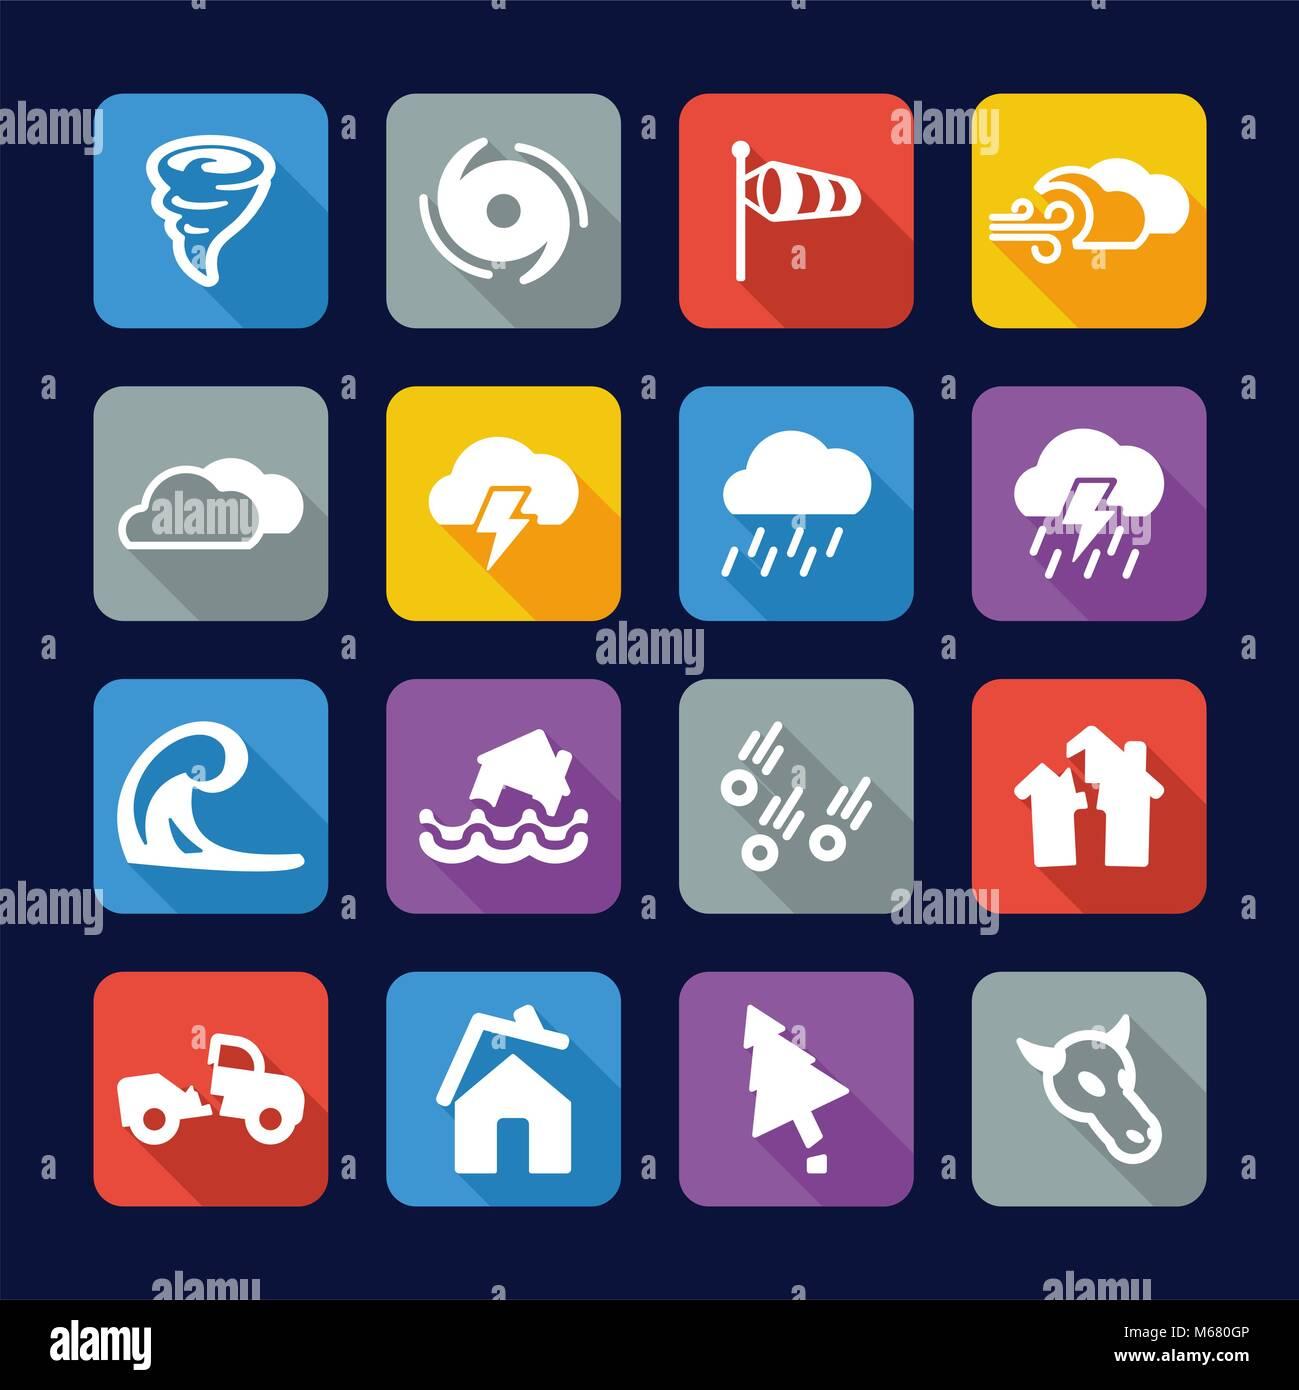 Tornado Icons Flat Design - Stock Vector